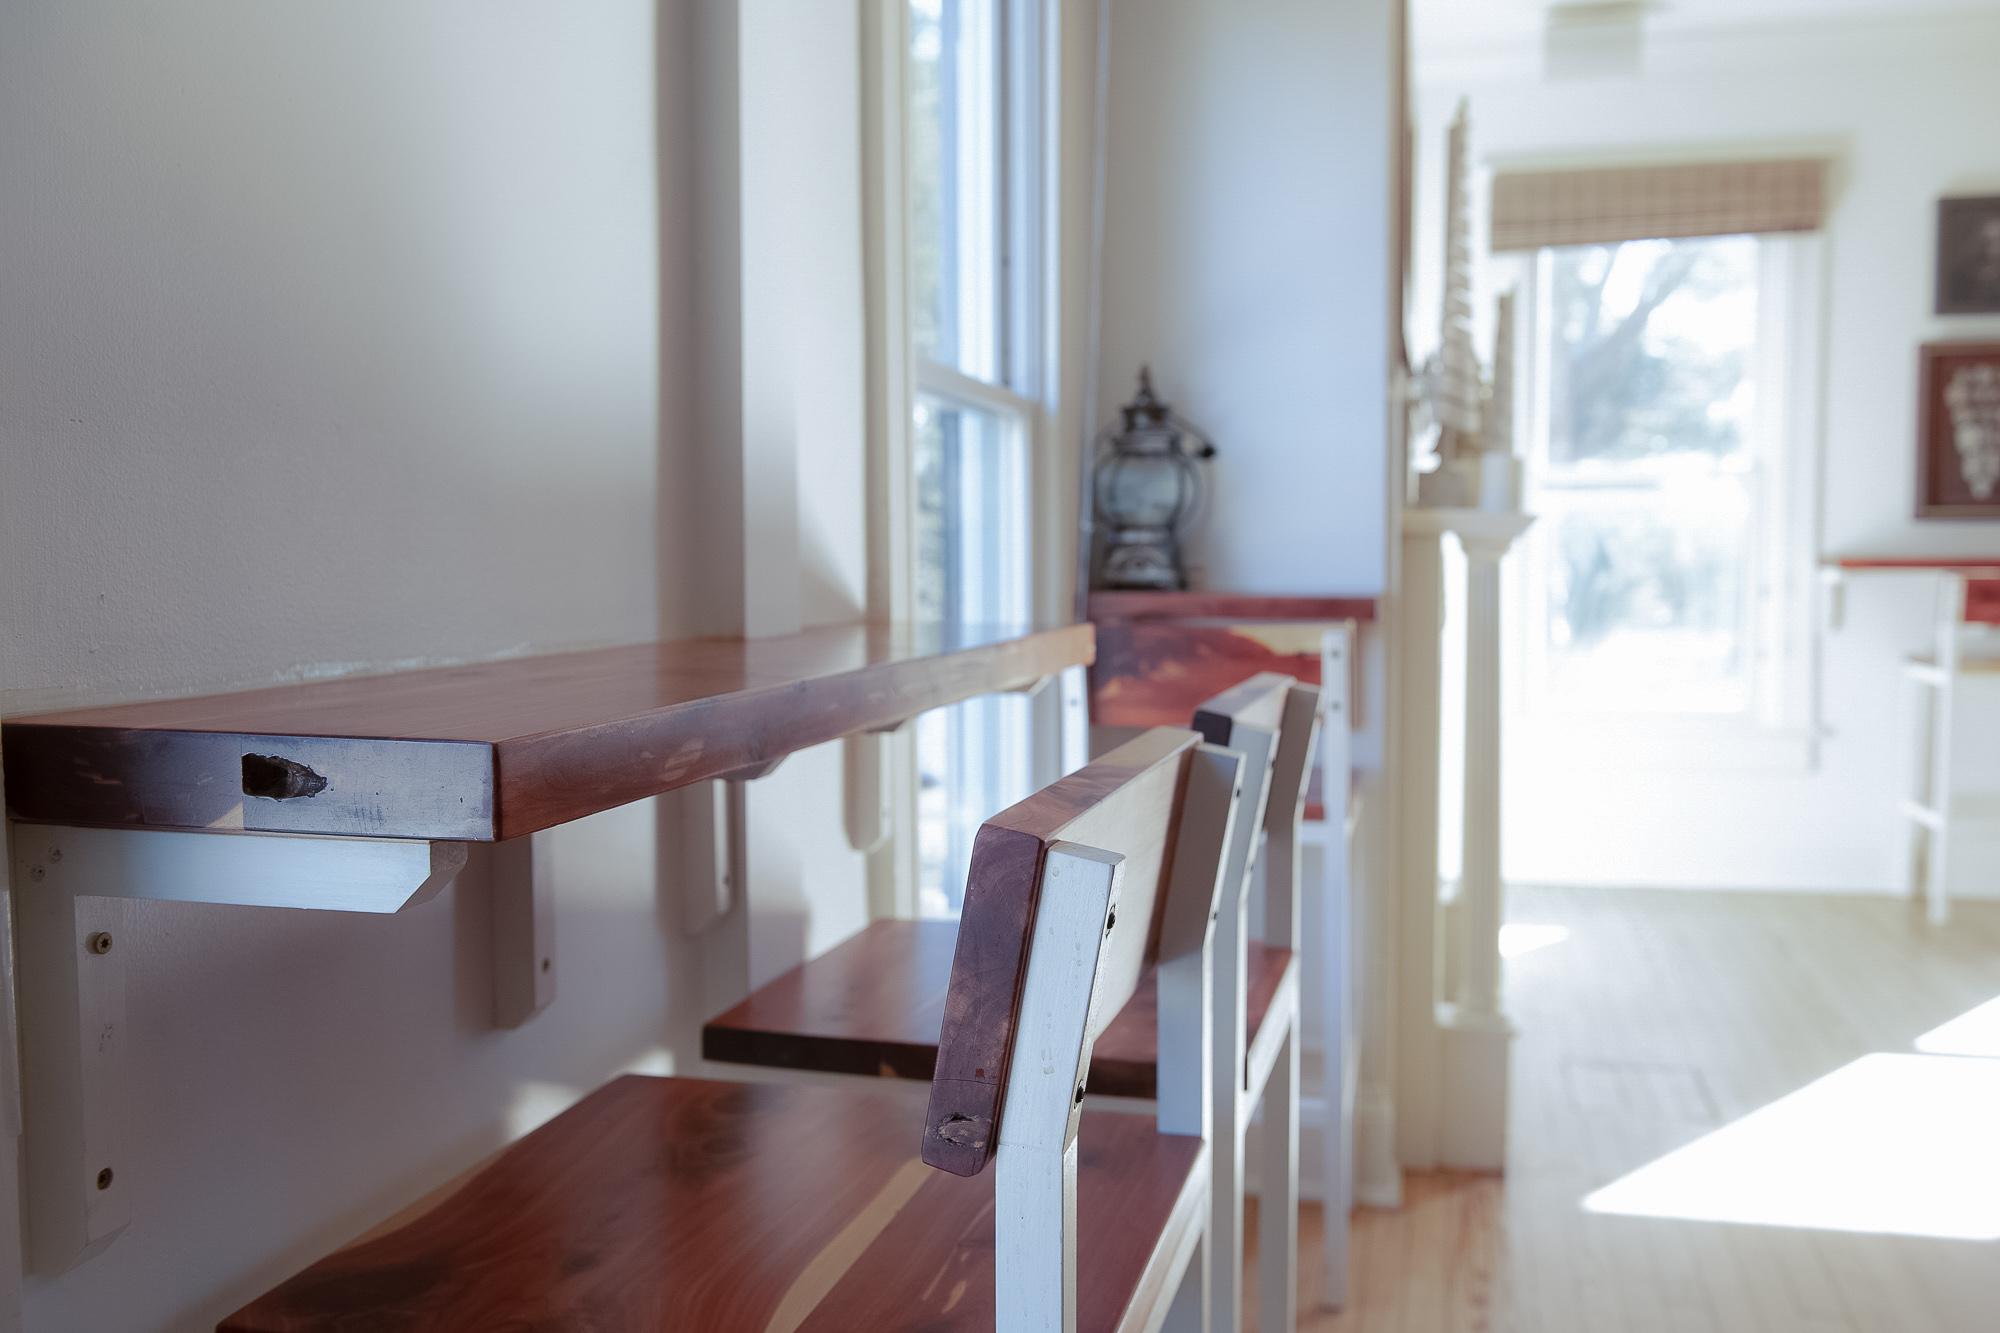 farmhouse-drinkrail-barstool.jpg